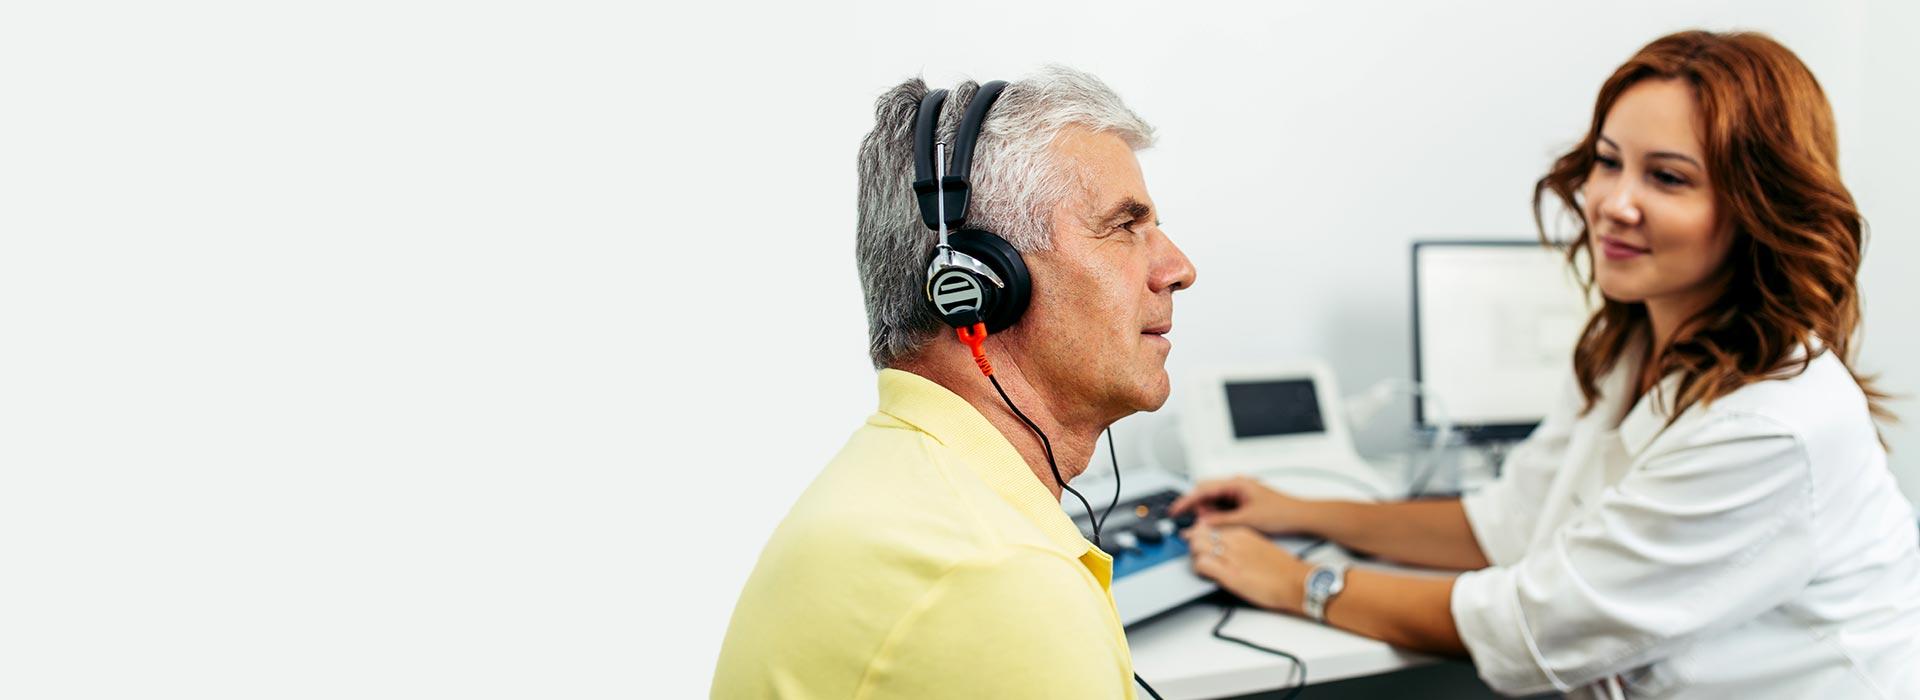 man-getting-hearing-test_1920x700